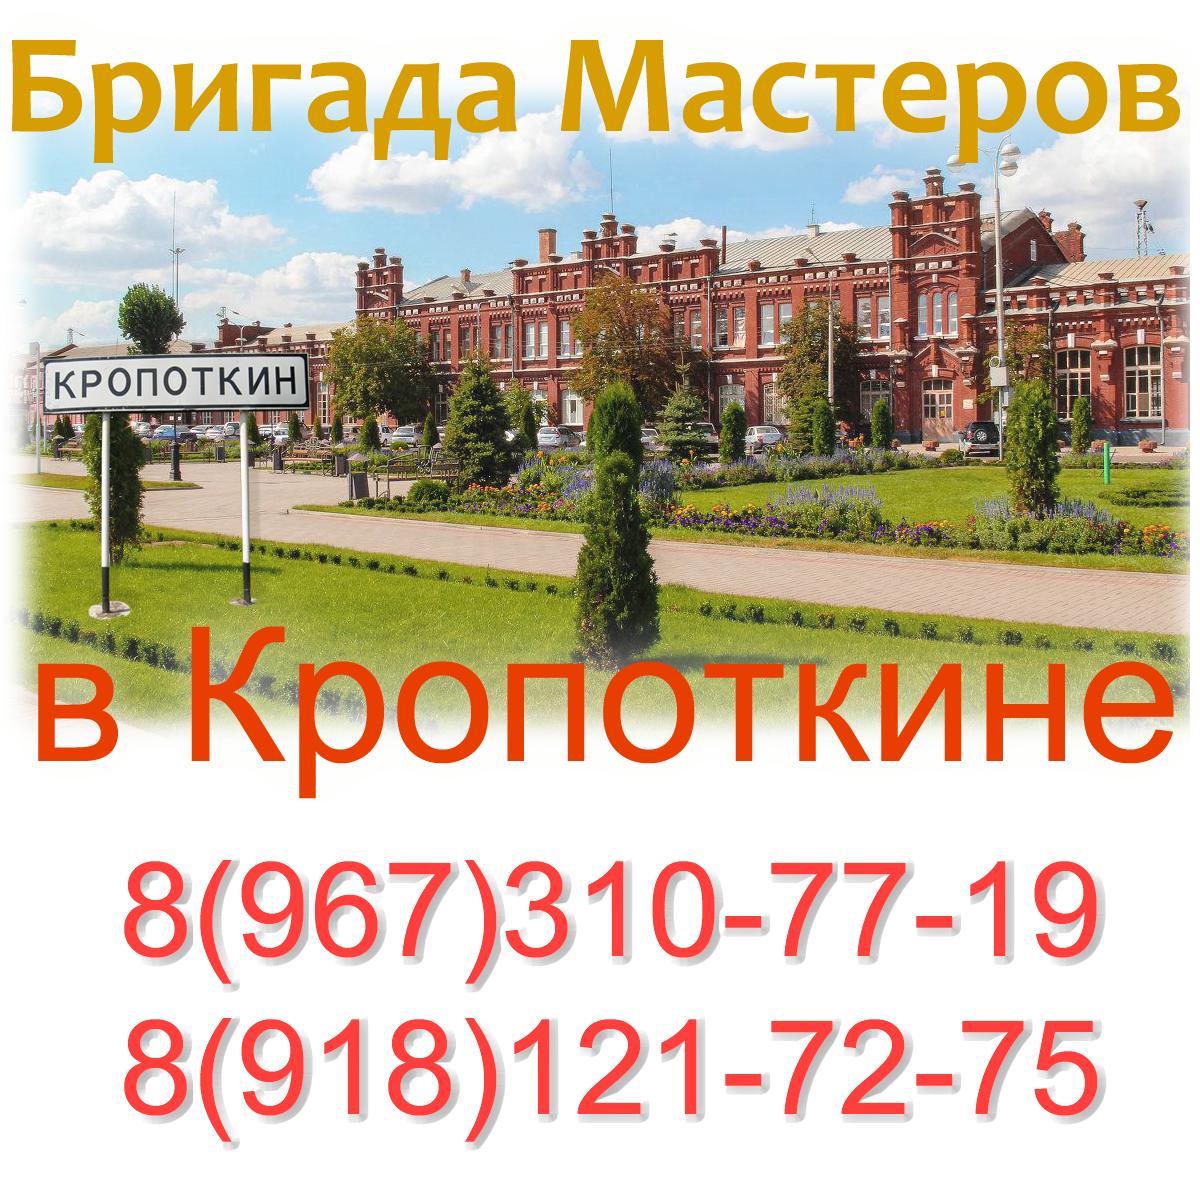 Сайт услуг Бригада Мастеров Кропоткин Гулькевичи